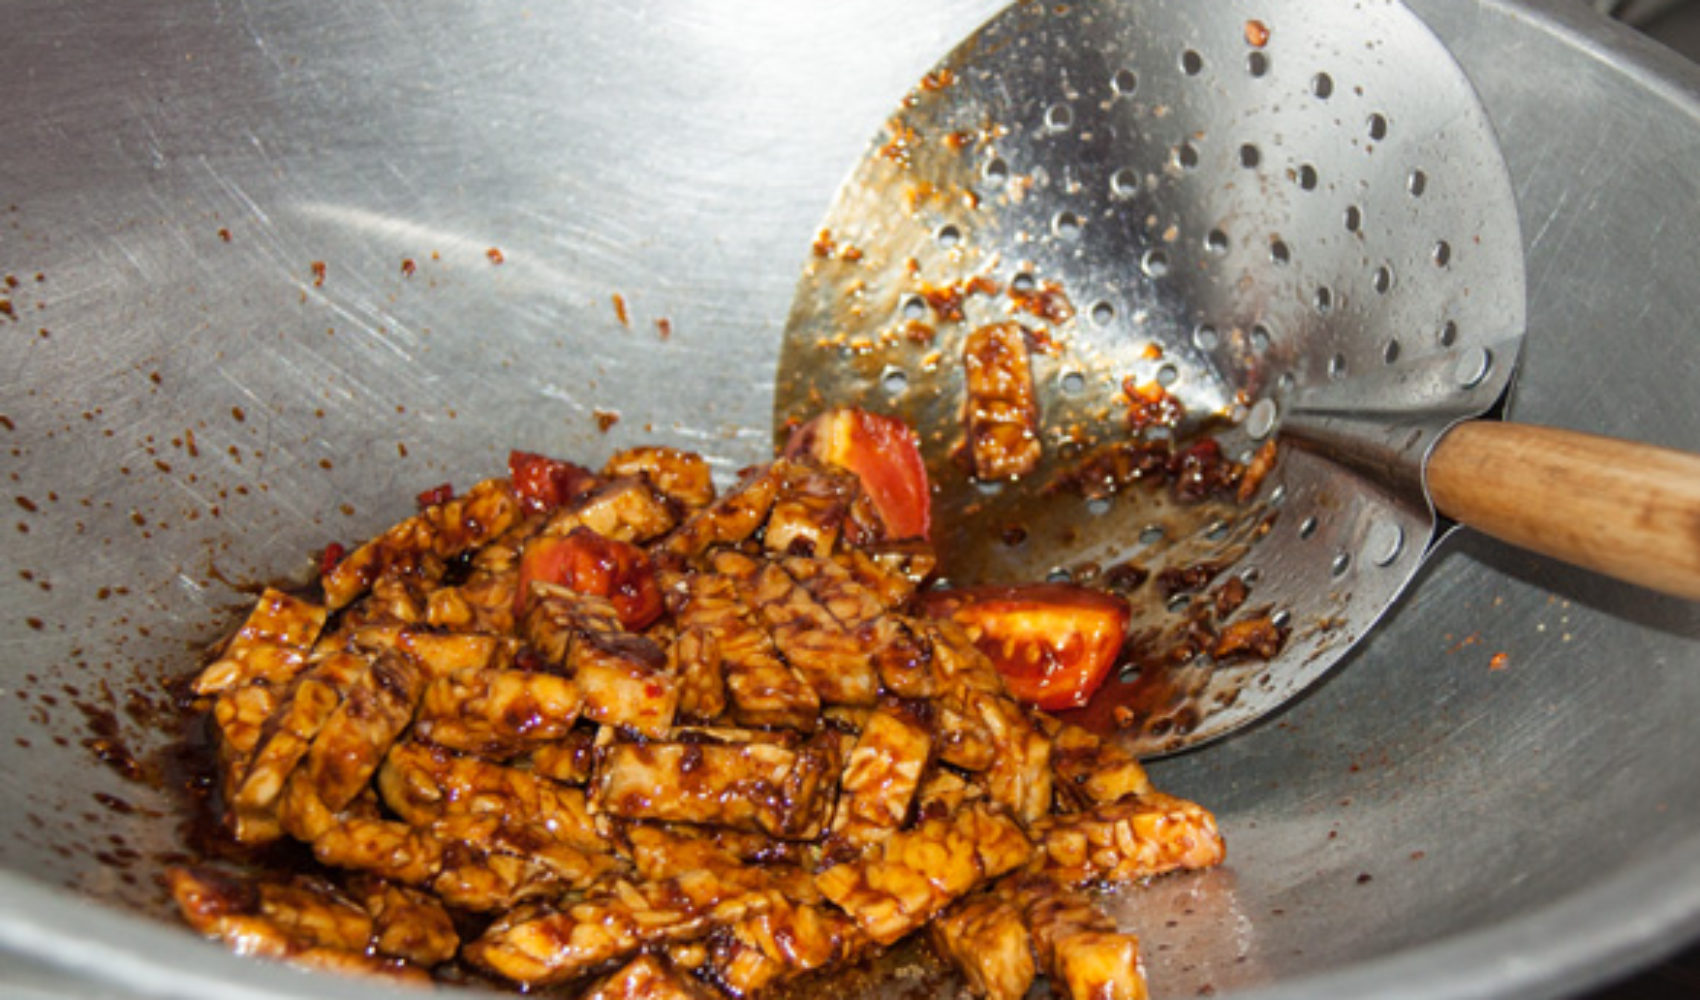 Bali V: Die Rezepte - Knuspriger Tempeh aus dem Wok